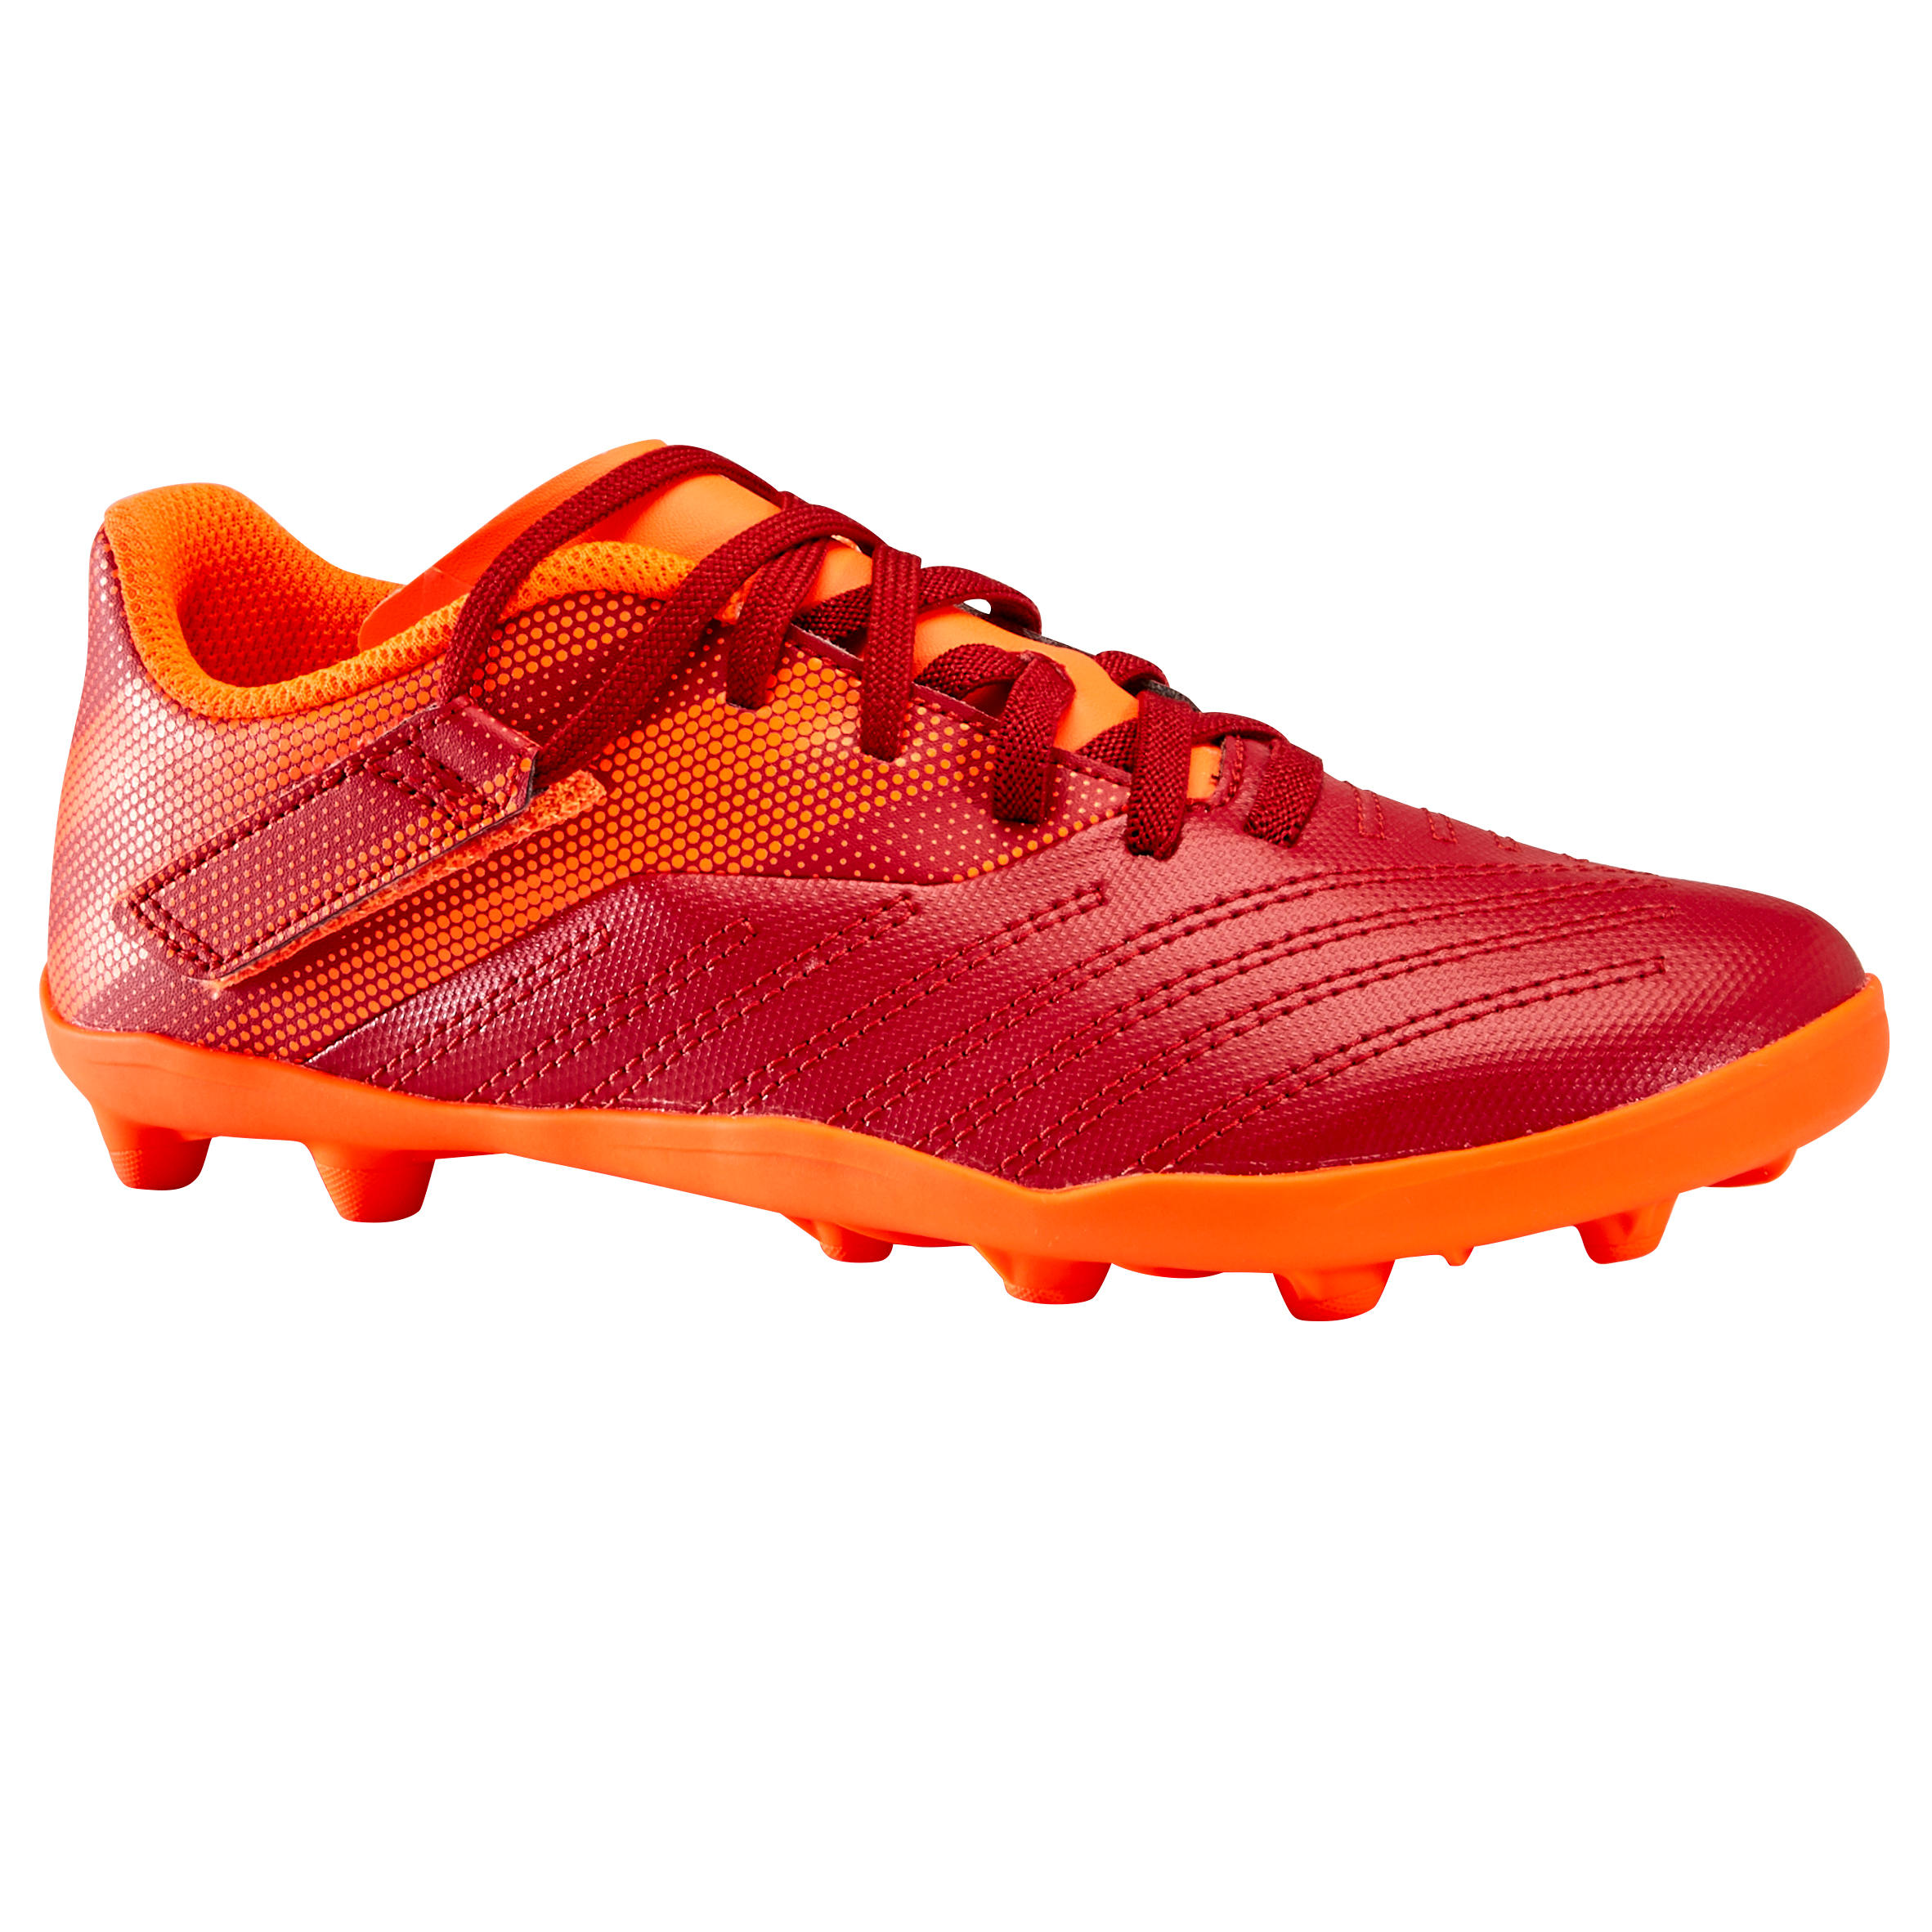 Children's Football Shoes